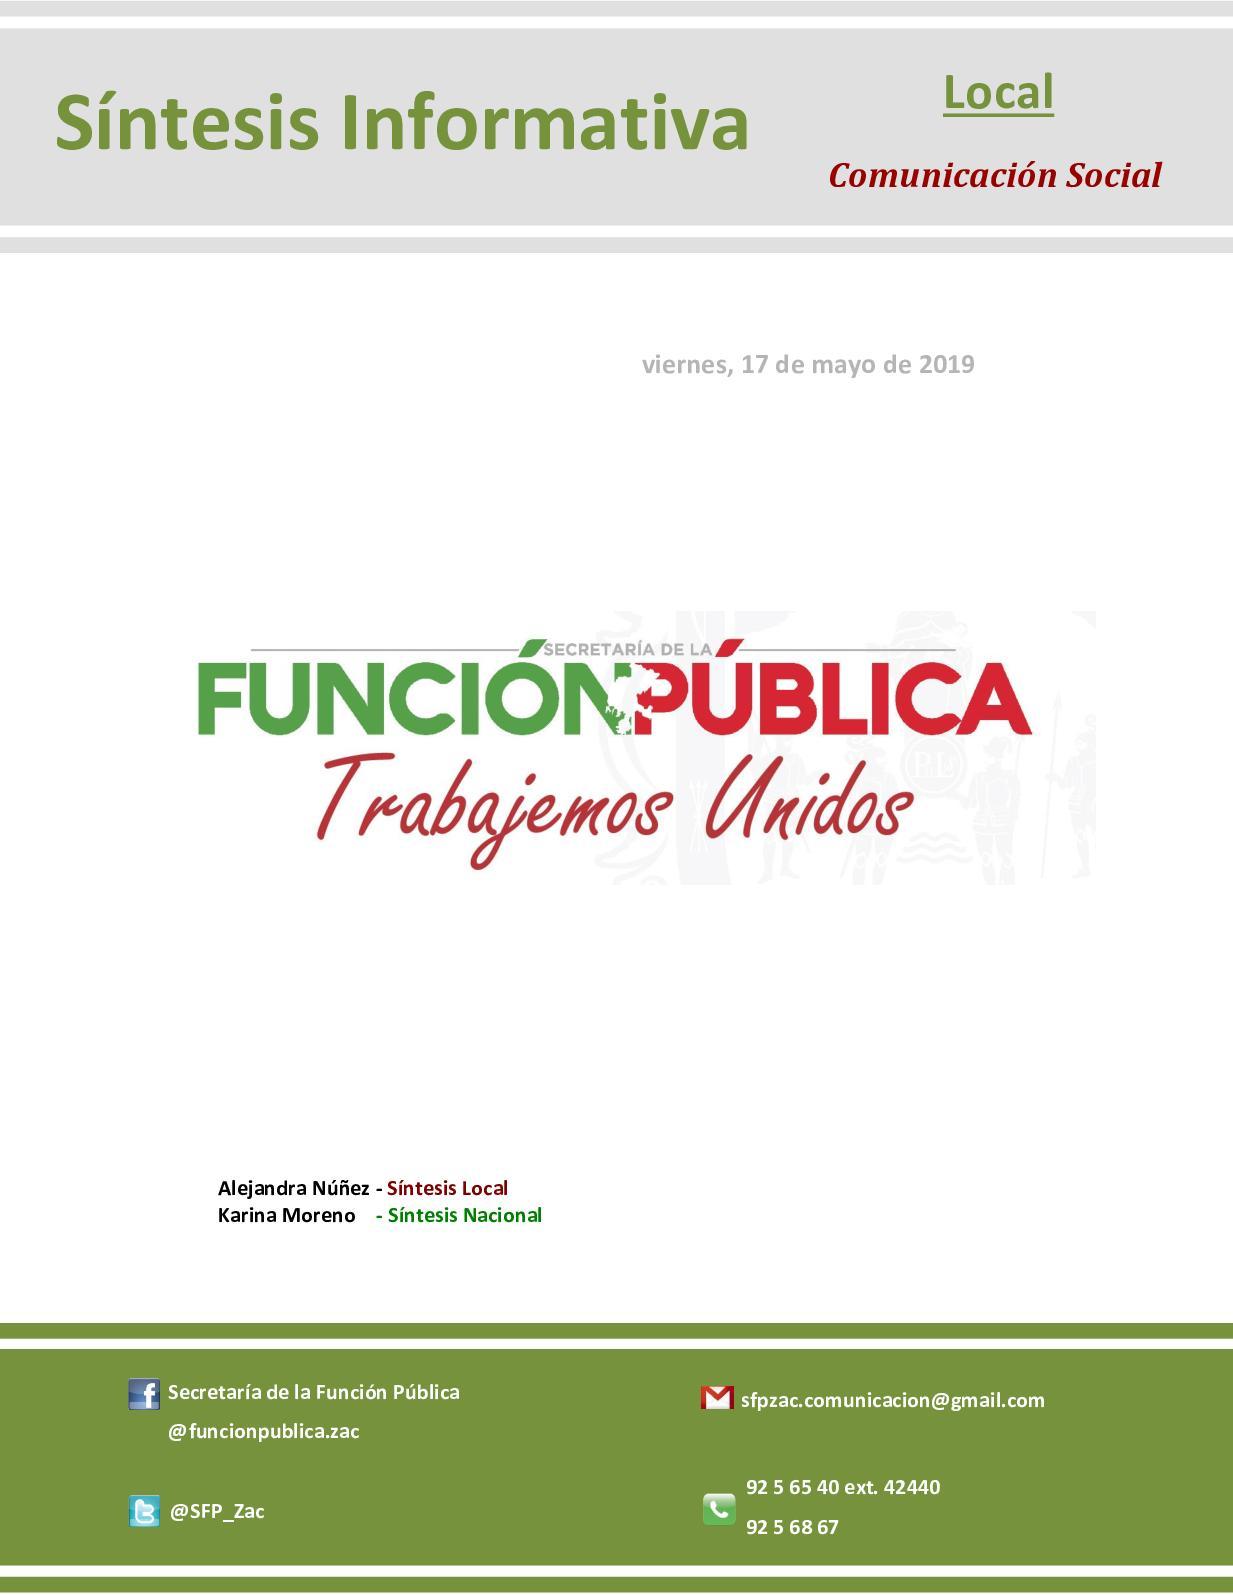 Síntesis Local-Nacional de Comunicación Social de la SFP 17-05-2019